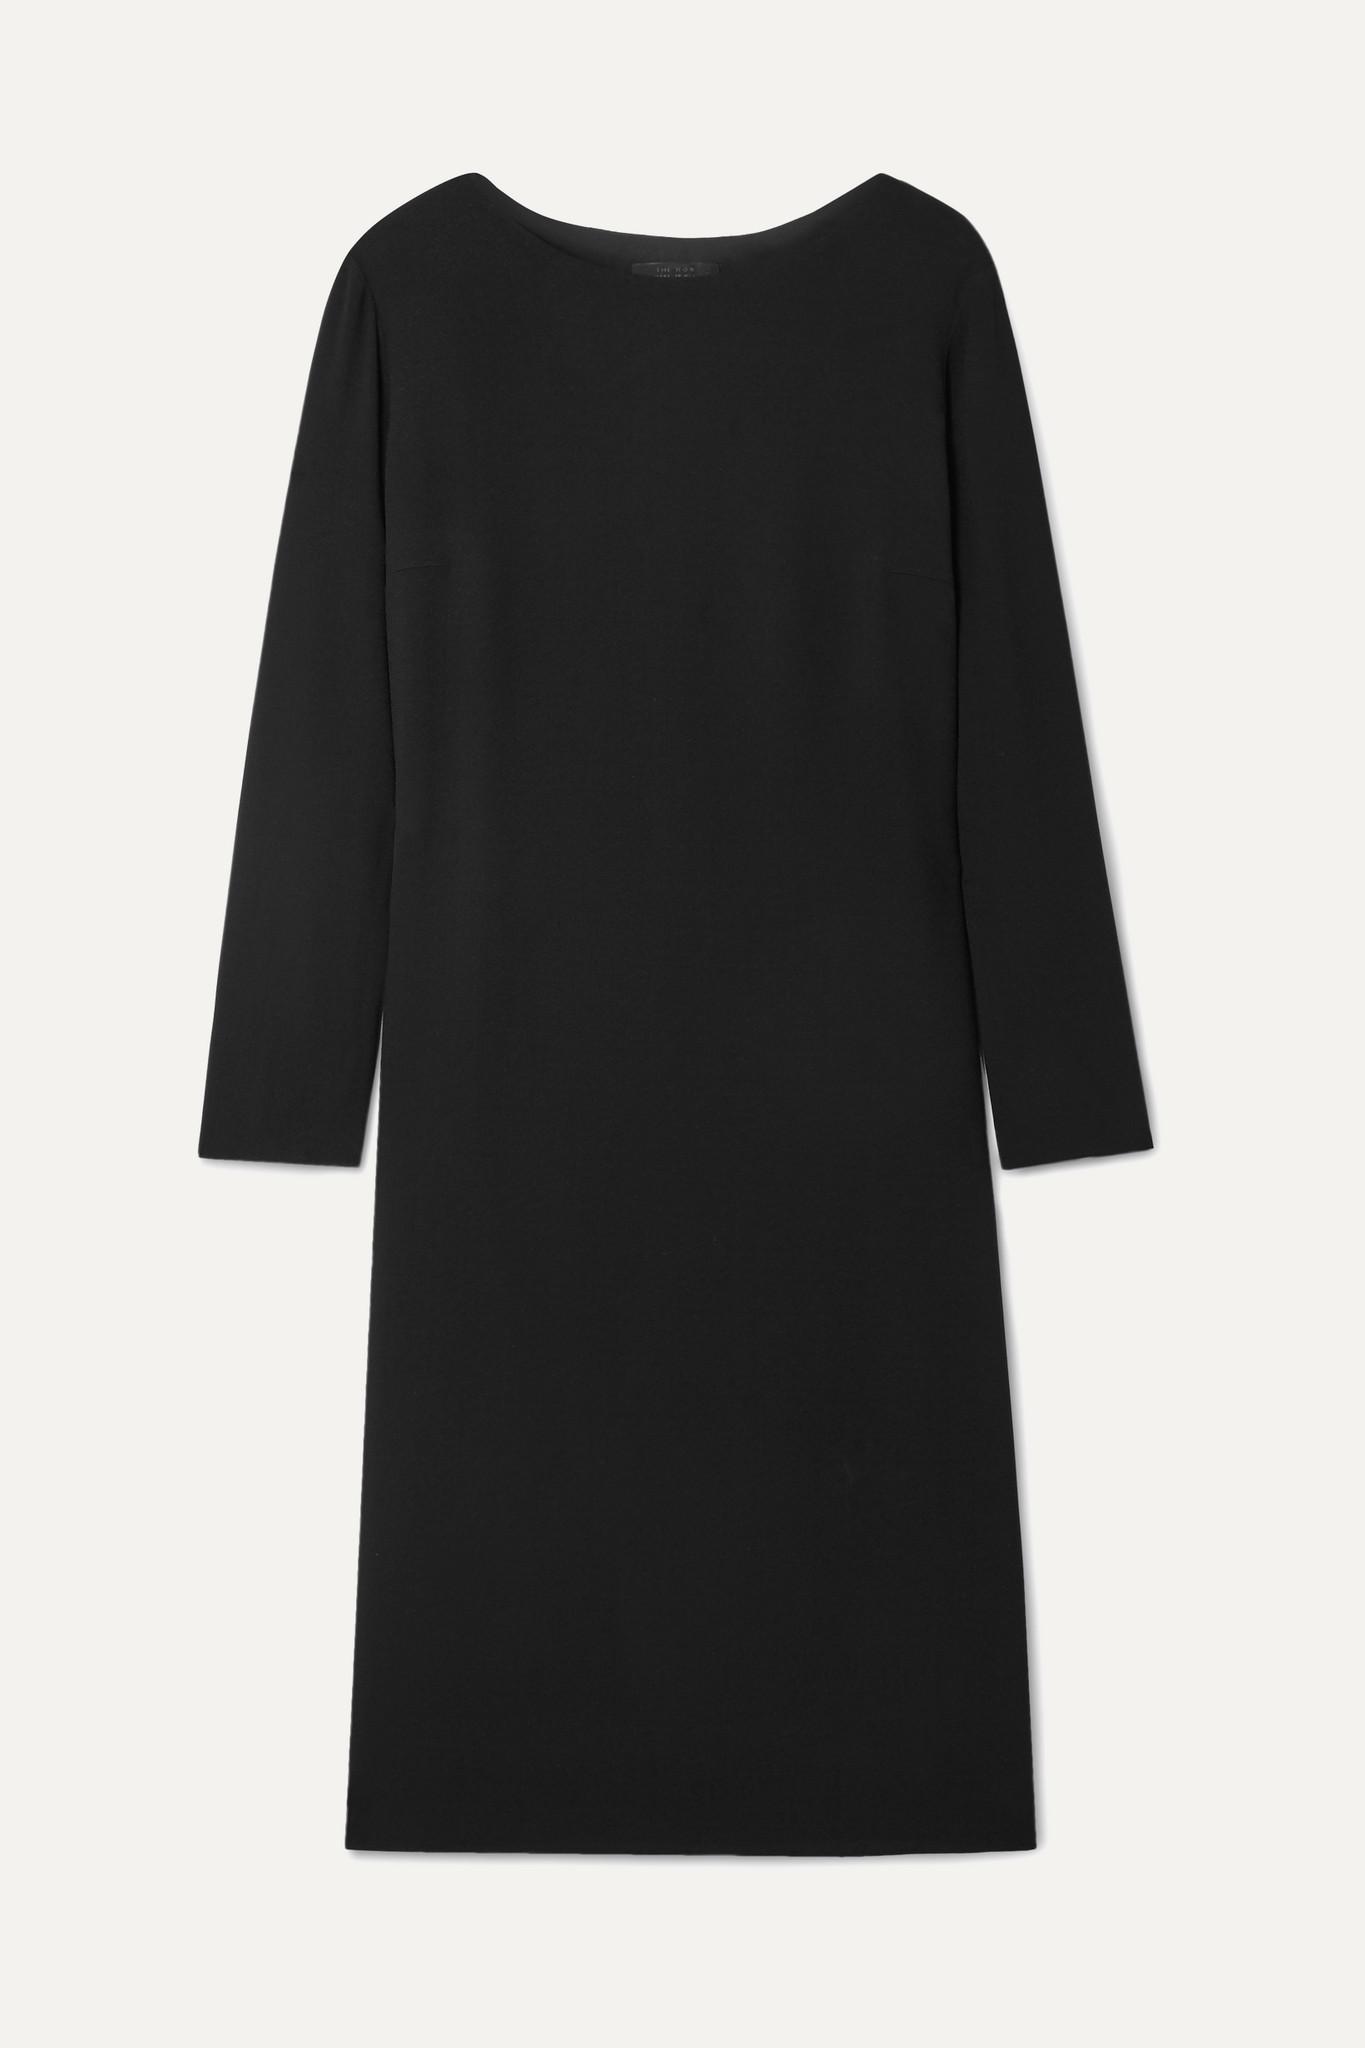 THE ROW - Larina 绉纱连衣裙 - 黑色 - US10